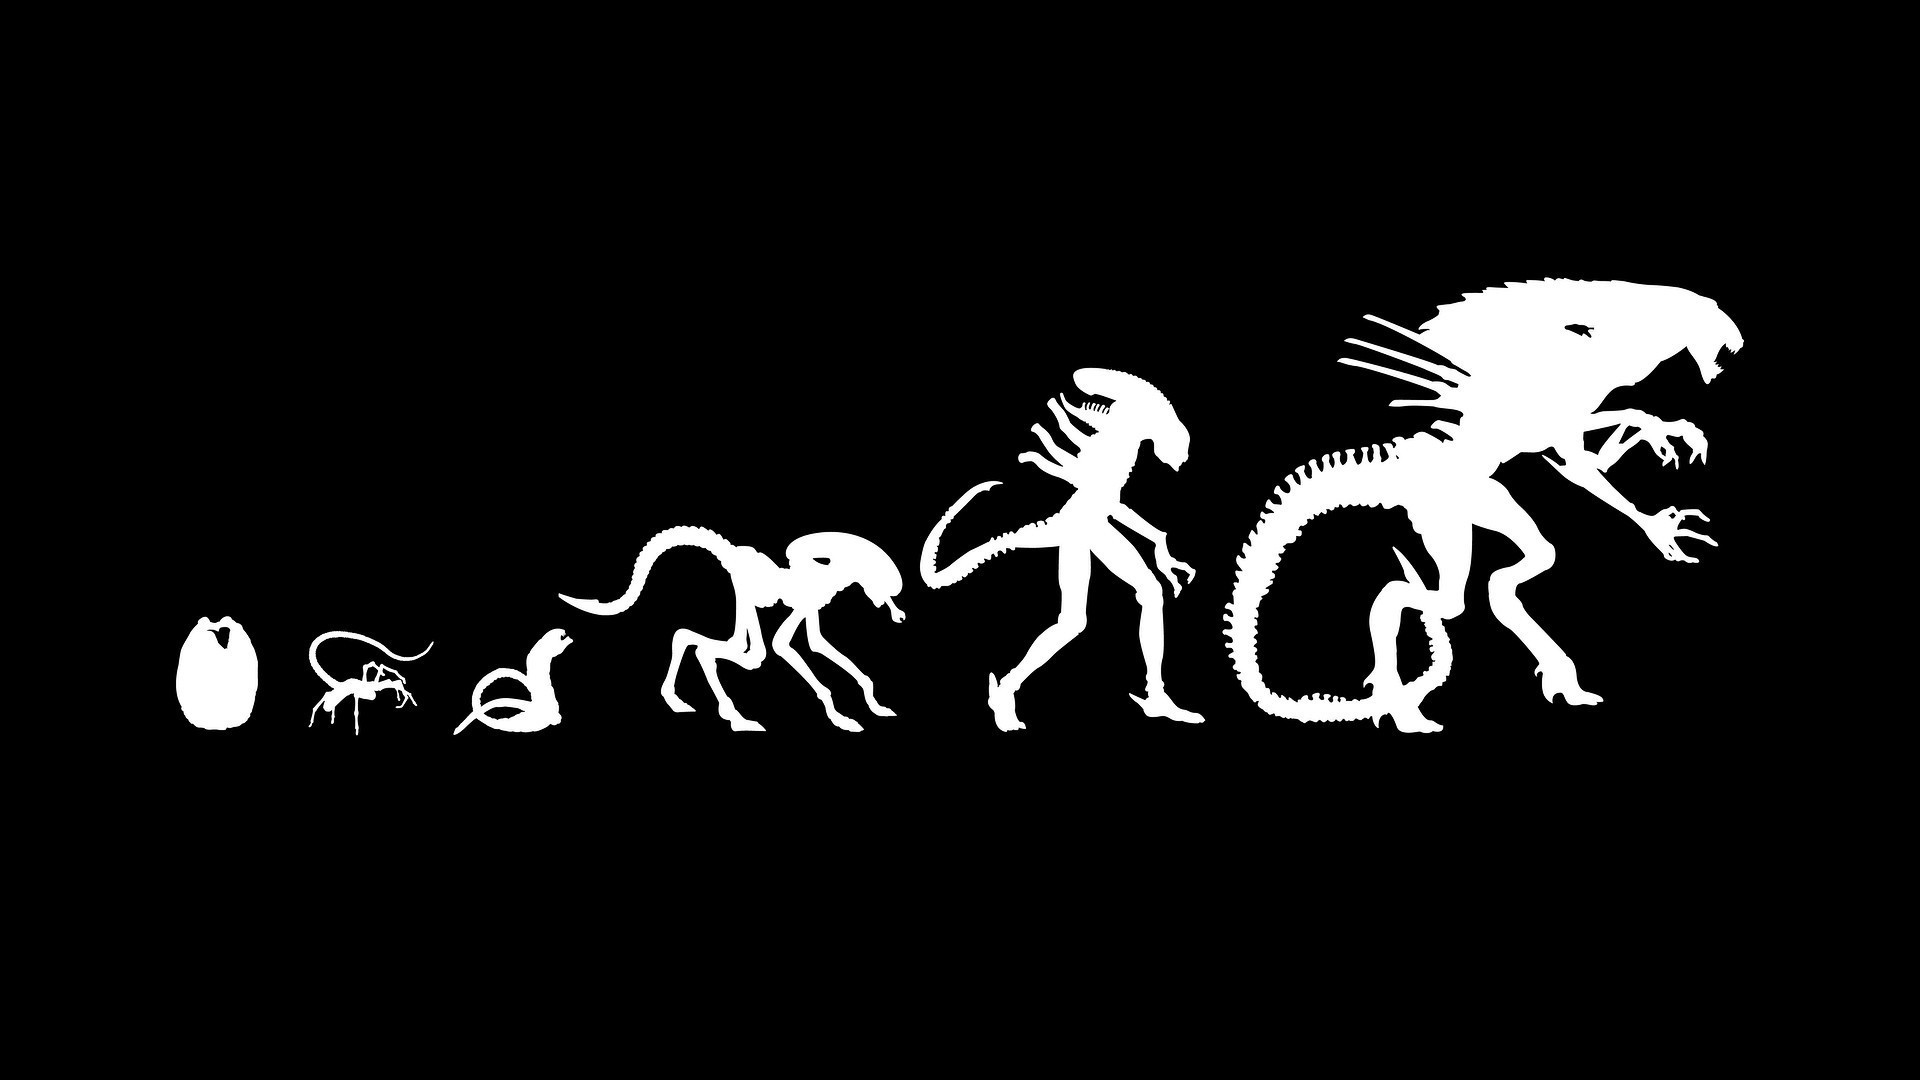 Res: 1920x1080, Alien evolution wallpaper